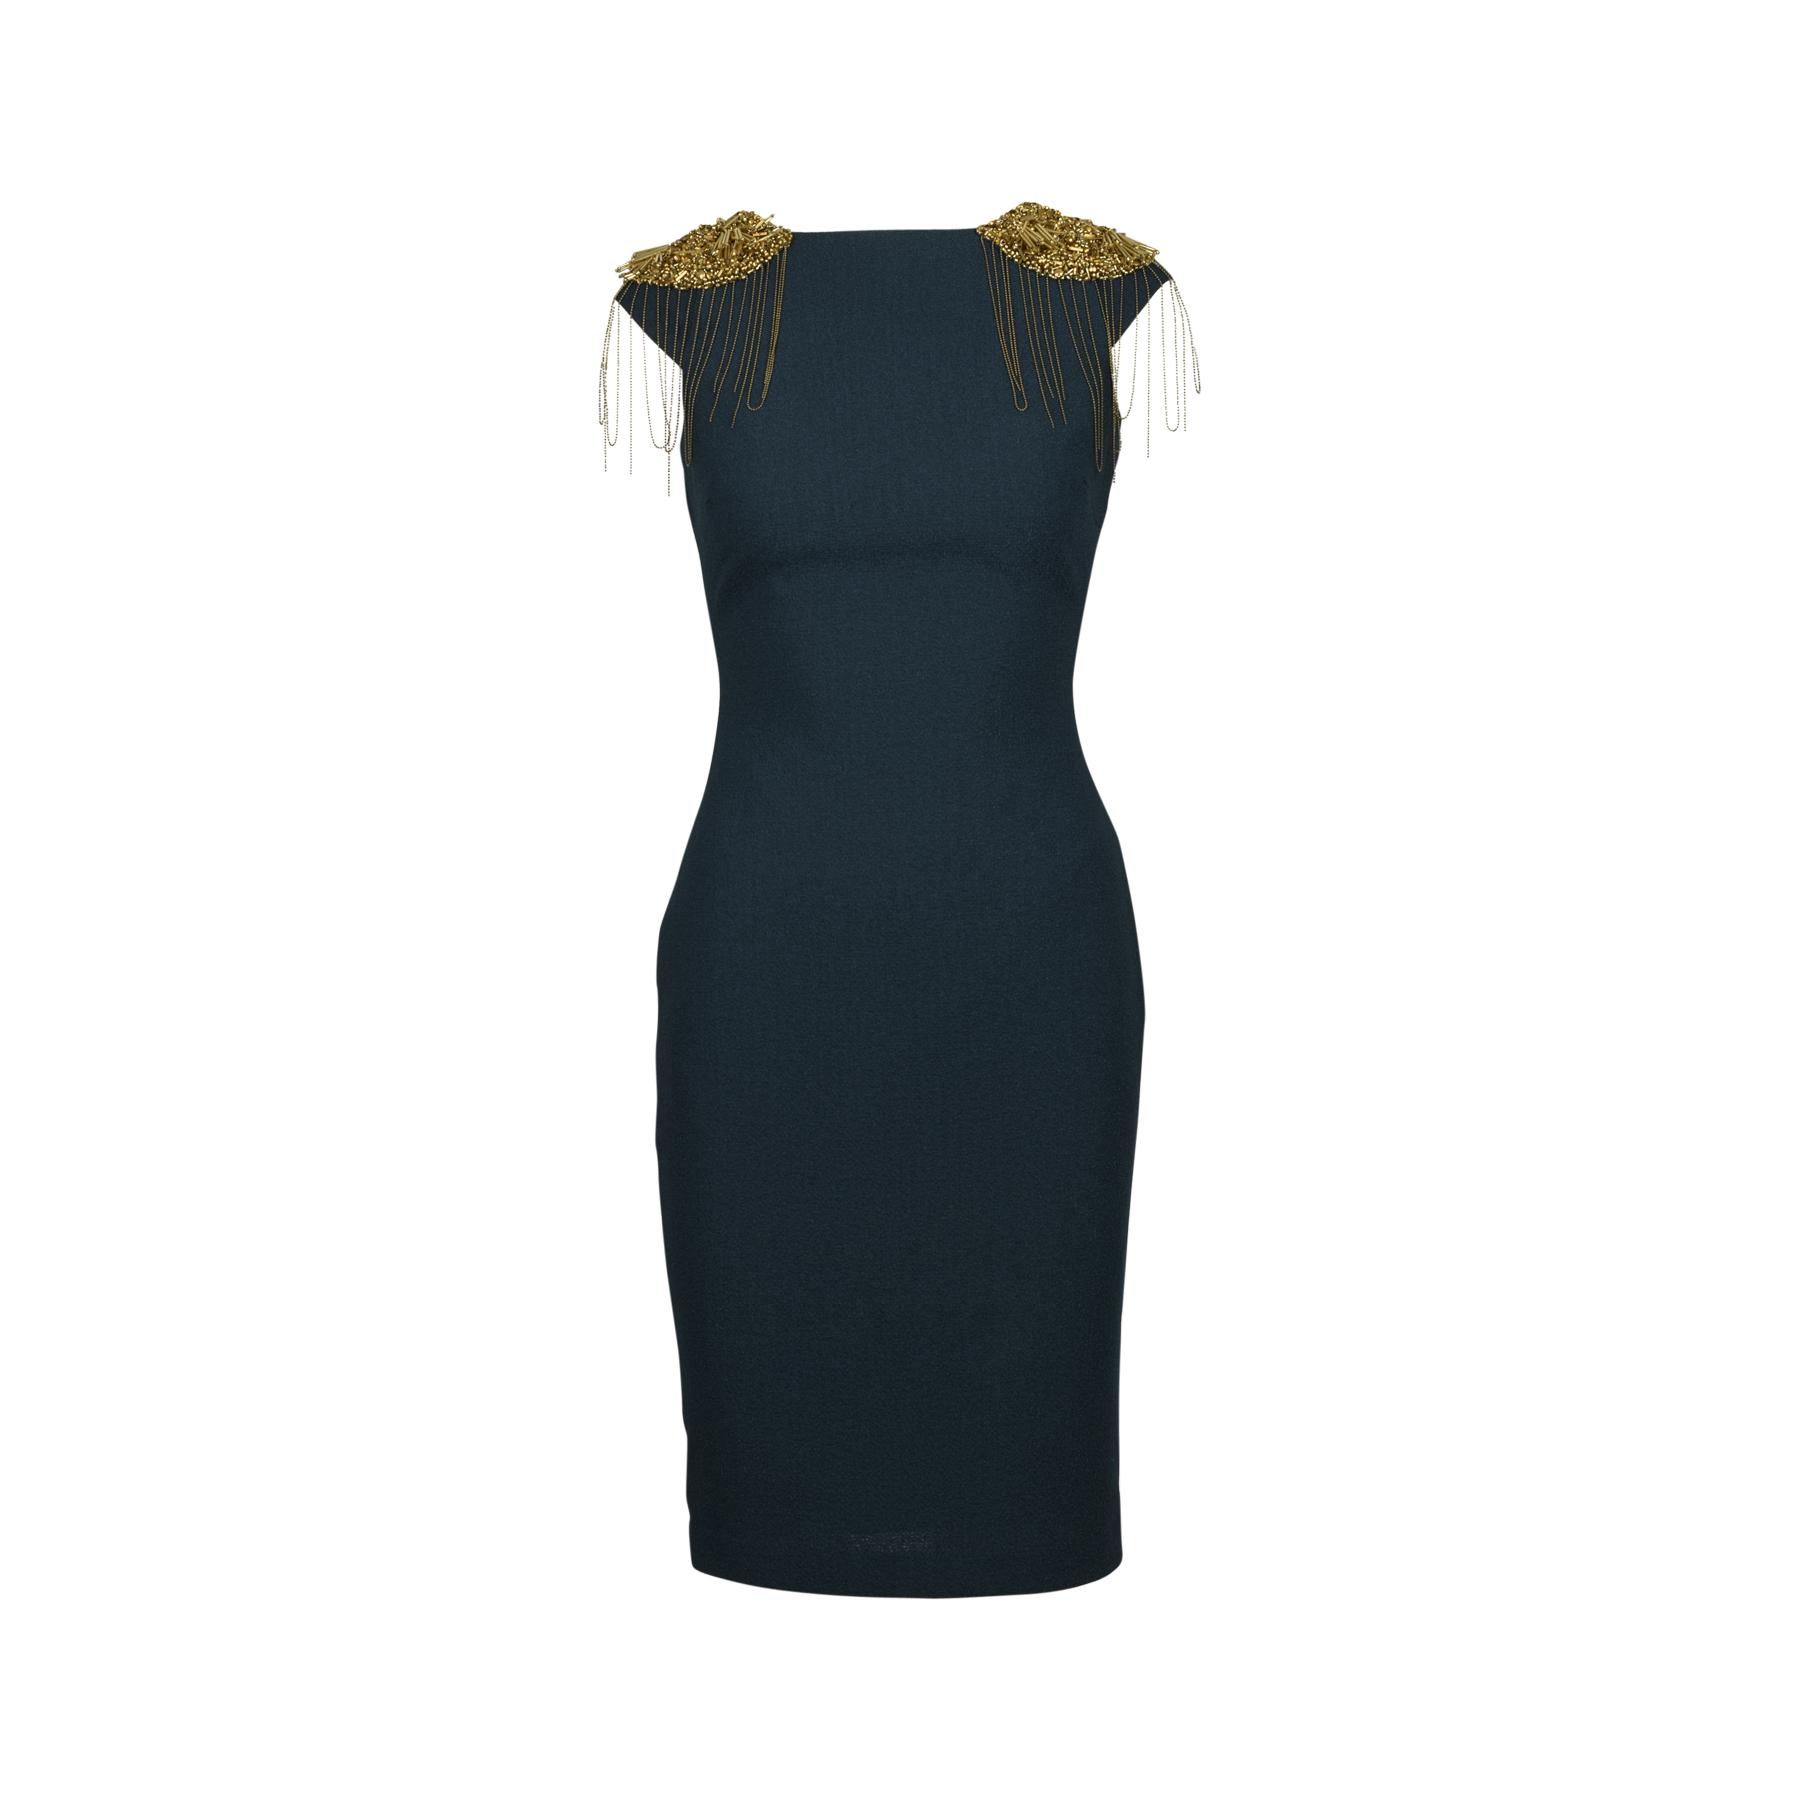 Second Hand Badgley Mischka Embellished Cap Sleeve Cocktail Dress ...